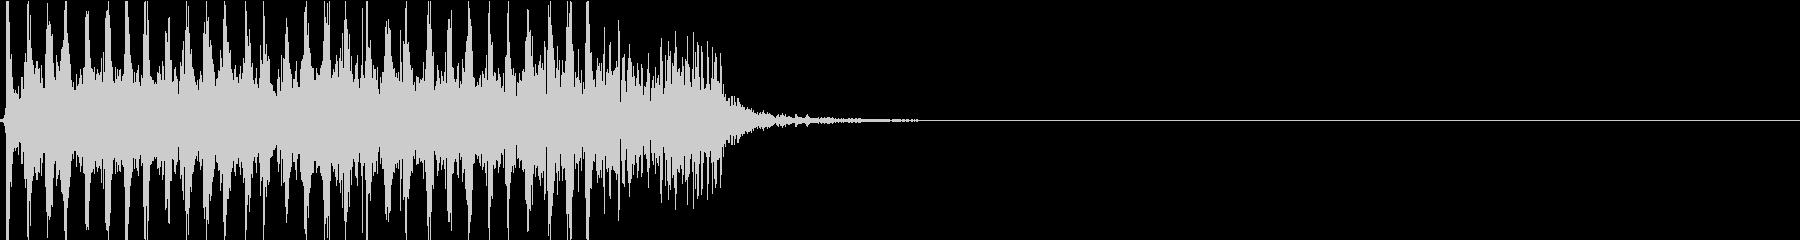 AUG系アサルトライフル発砲音の未再生の波形